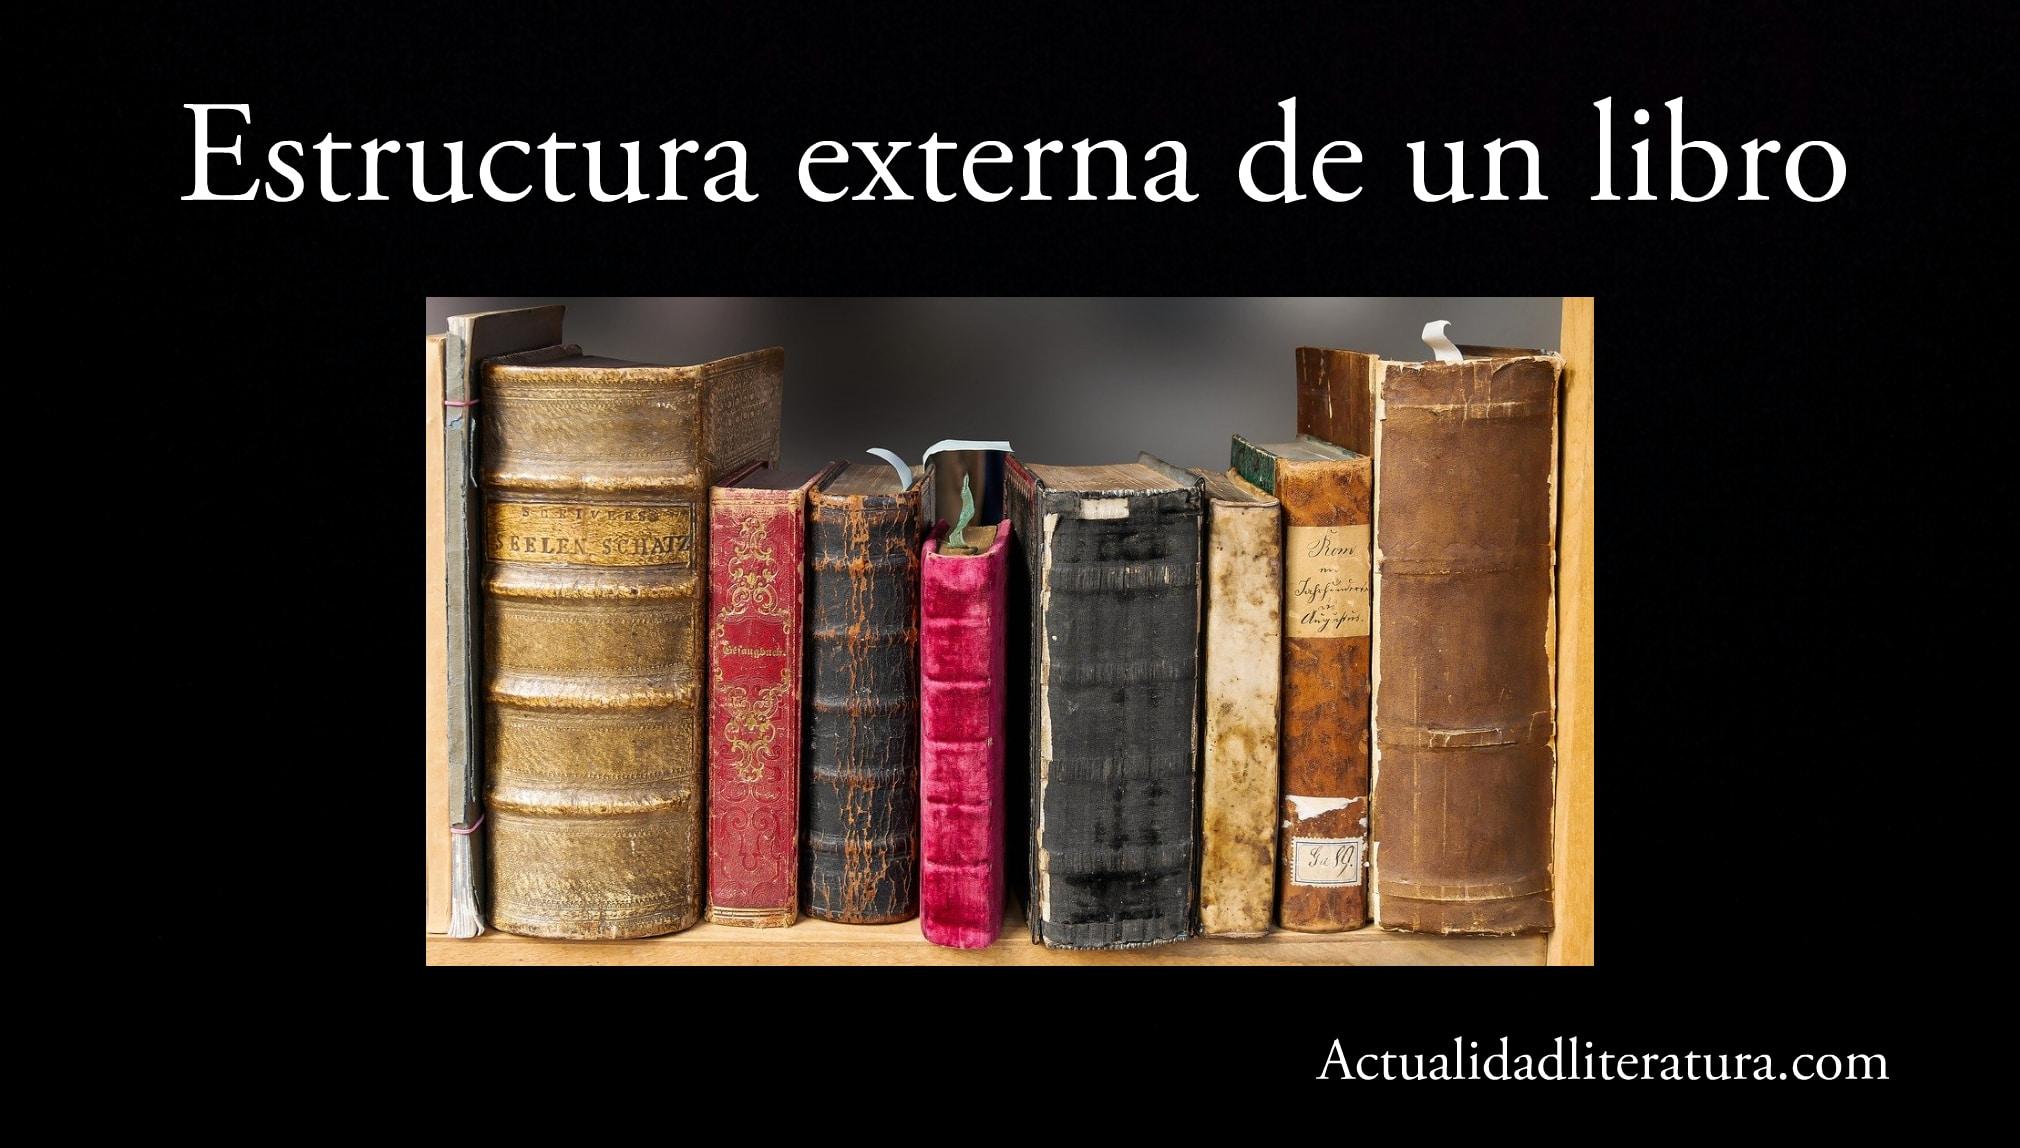 Estructura externa de un libro.